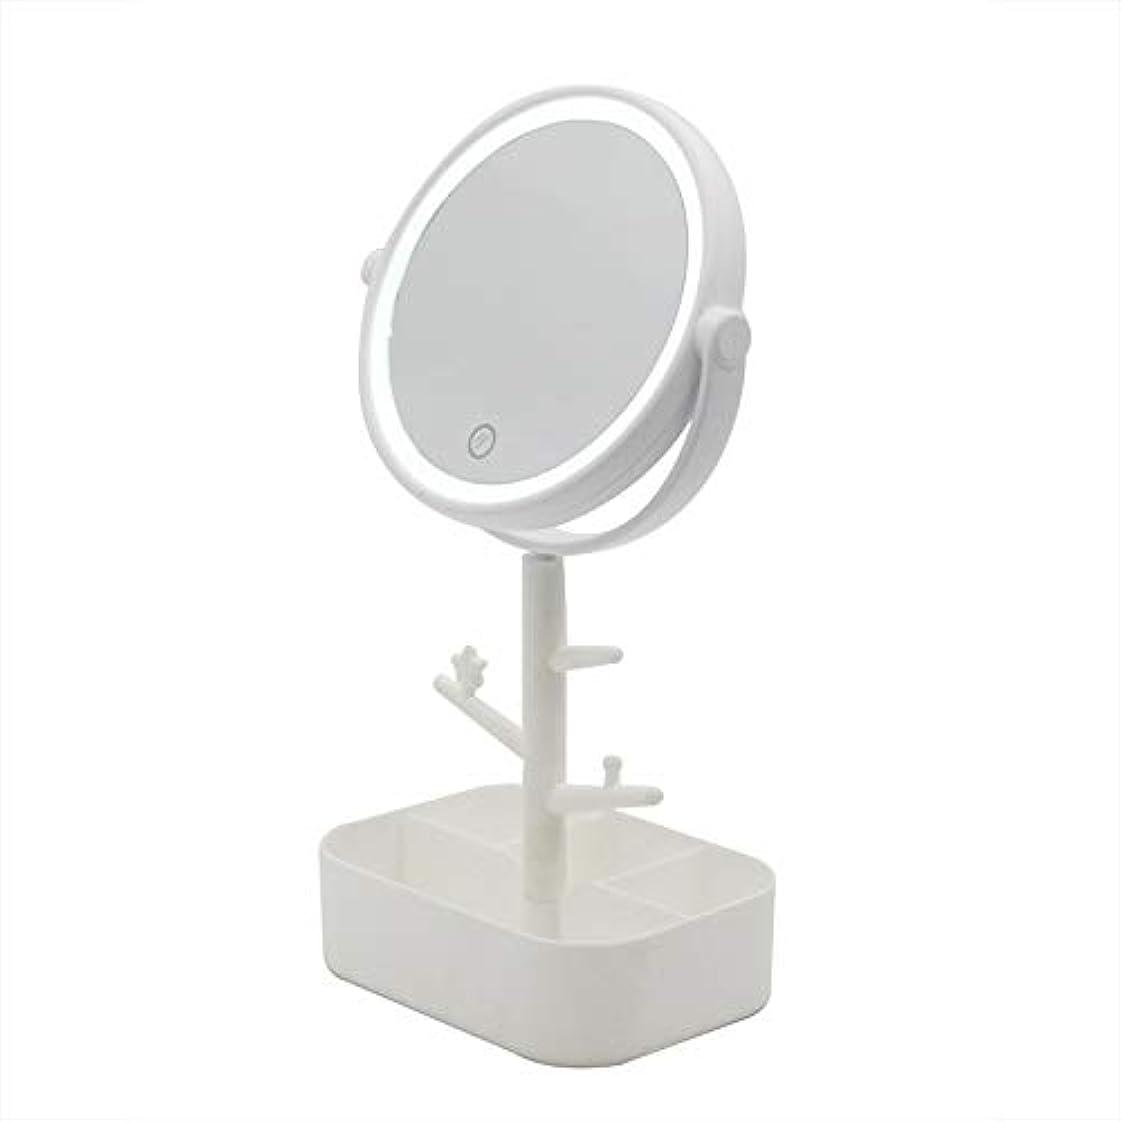 Lecone LED化粧鏡 女優ミラー 卓上ミラー 360度調整可能 スタンドミラー LEDライト メイク 化粧道具 円型 収納ケース 可収納 USB給電 (ホワイト)